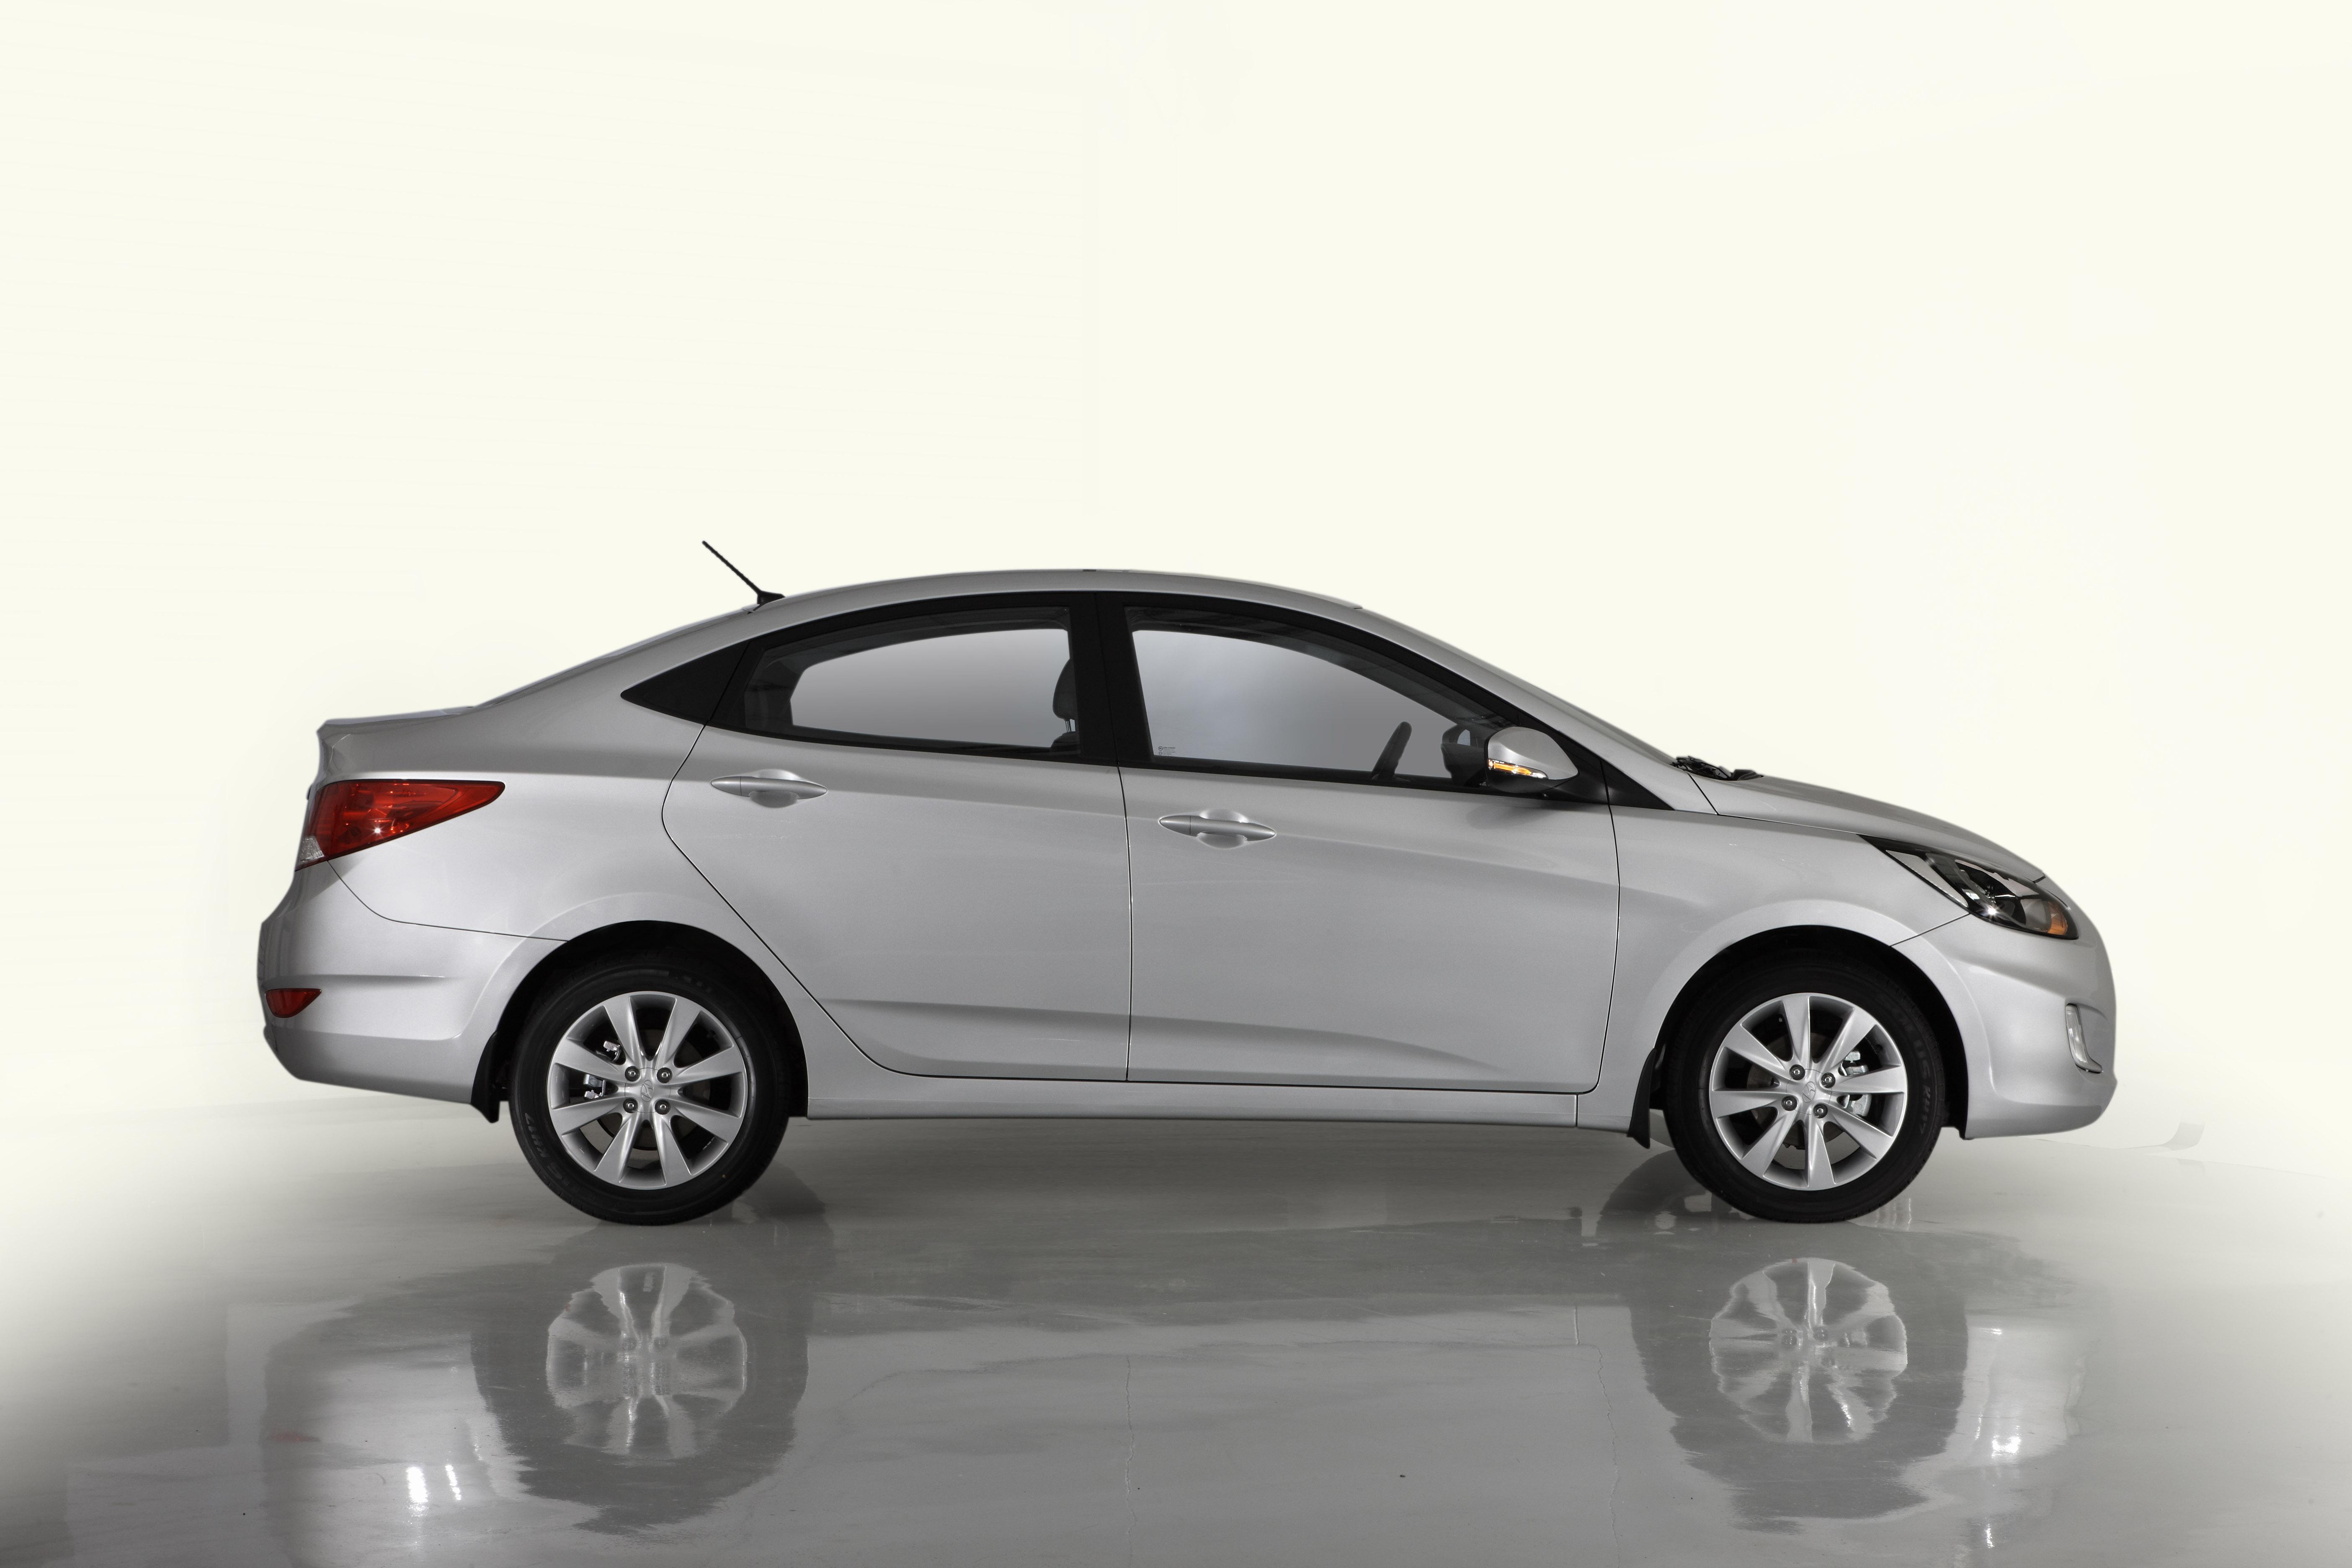 Rbr4 Hyundai Motor Company